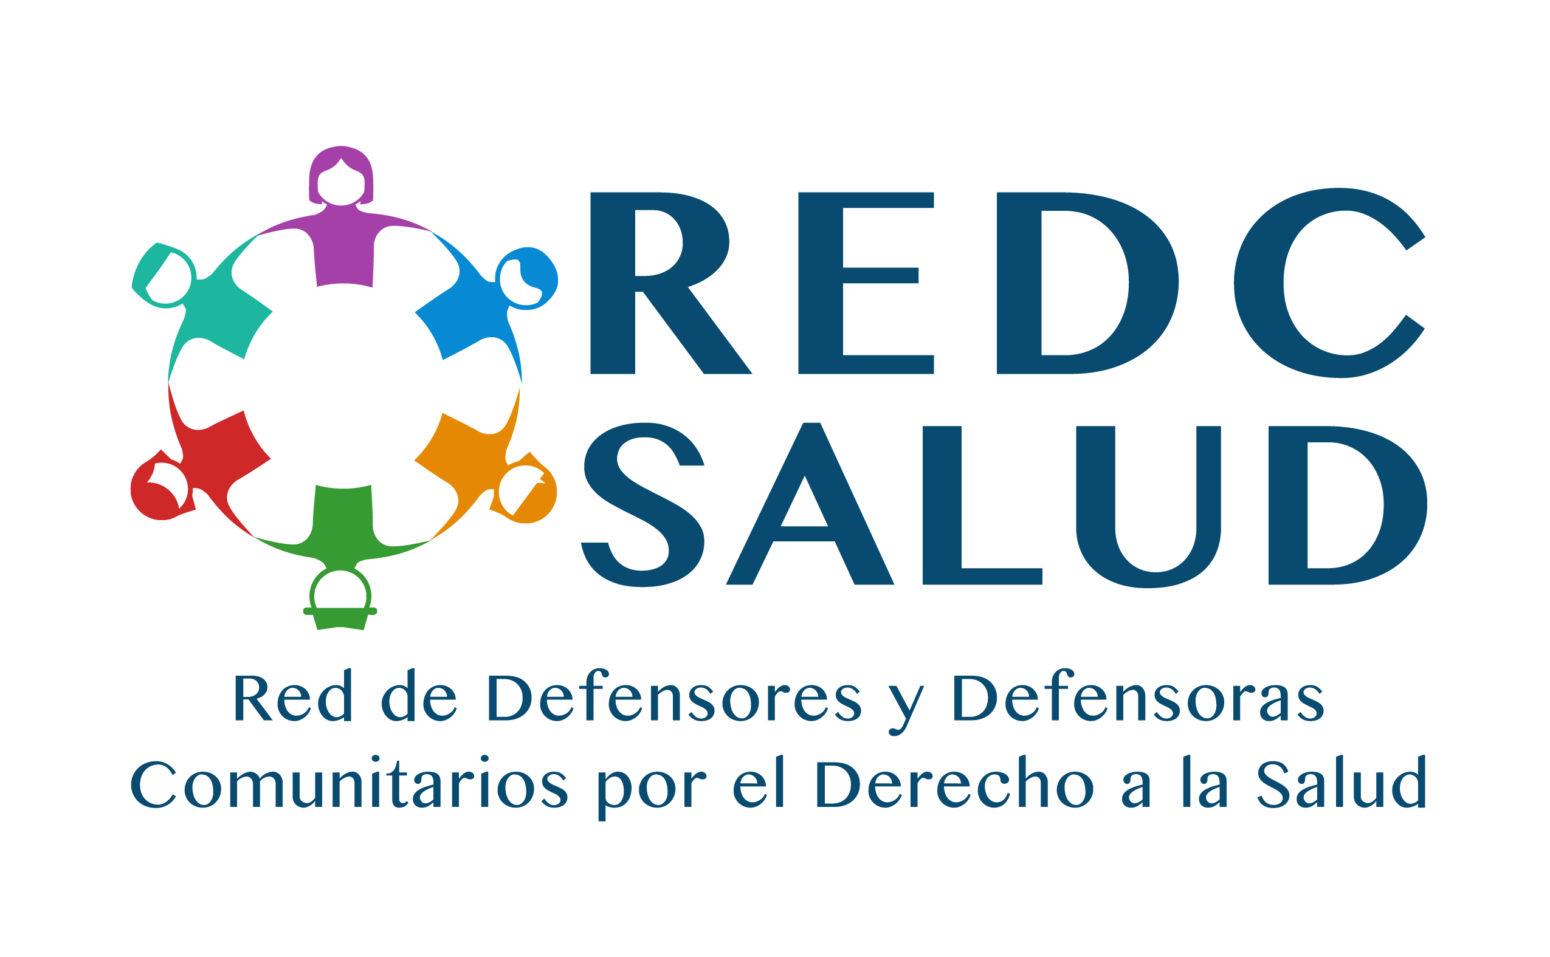 REDC-Salud Guatemala